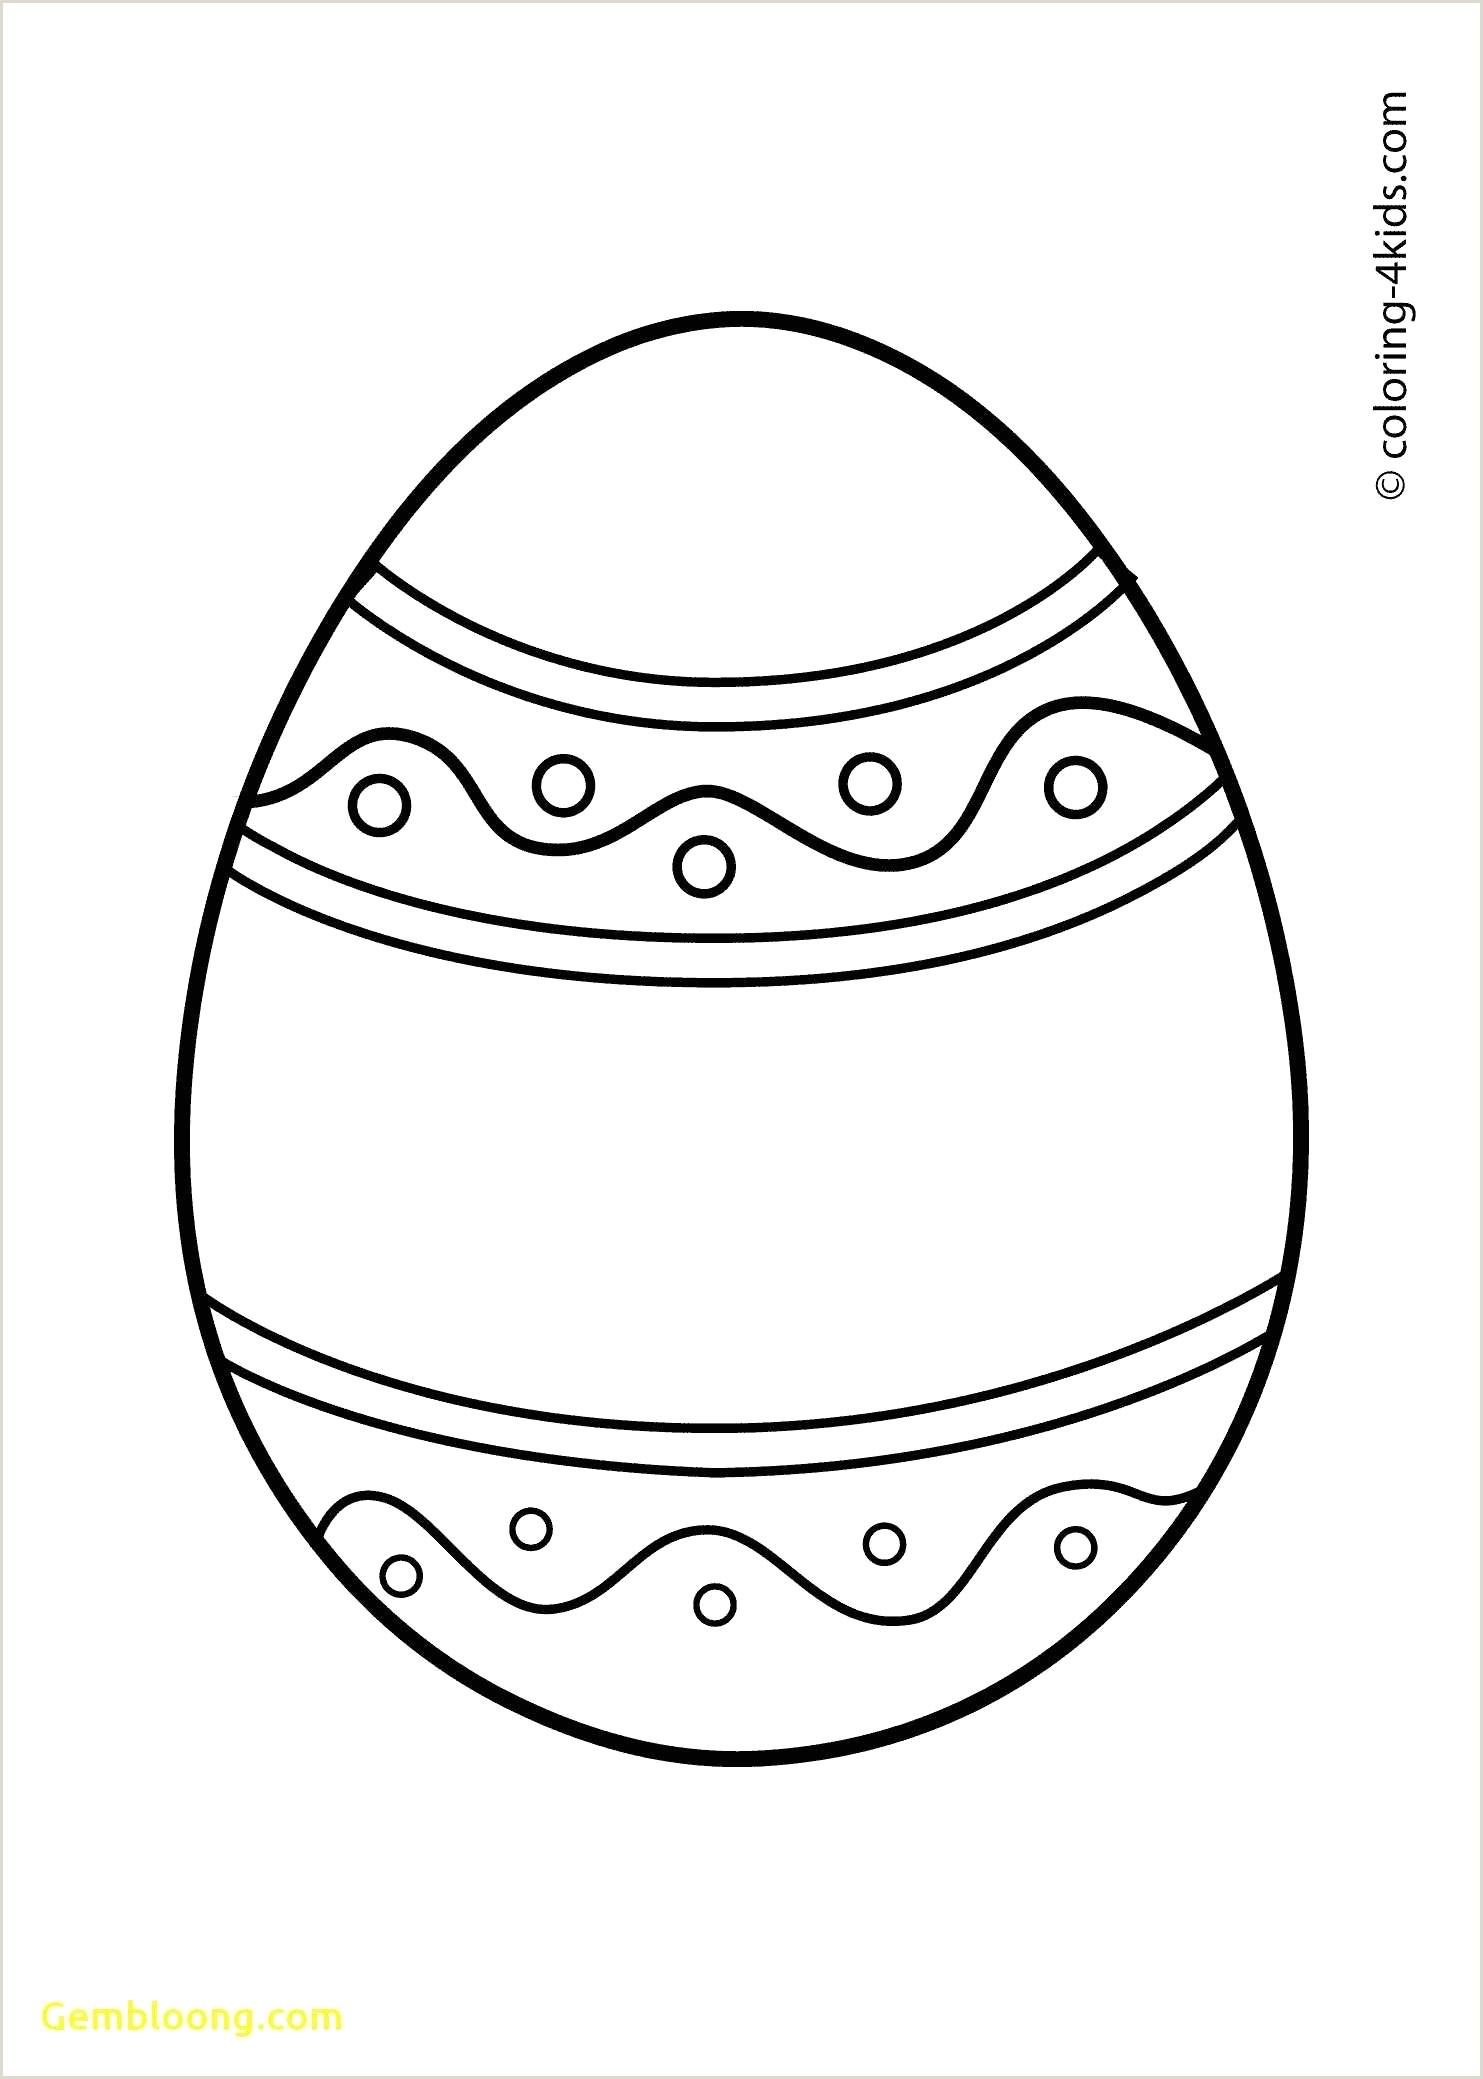 Easter Egg Preschool Worksheets